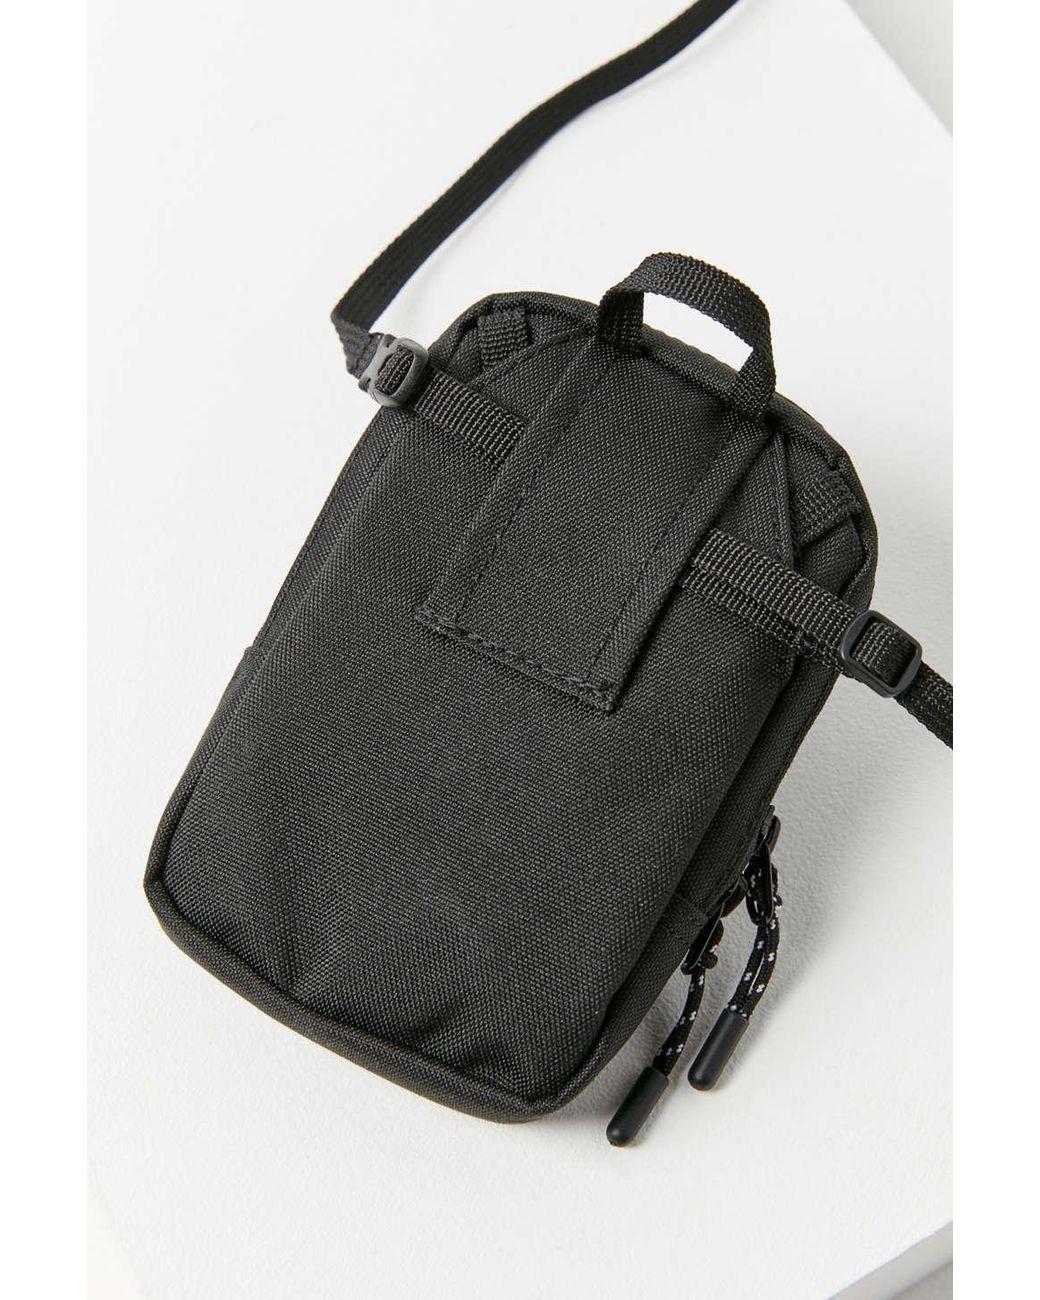 c716f5bccc3 Lyst - Herschel Supply Co. Sinclair Small Crossbody Bag in Black